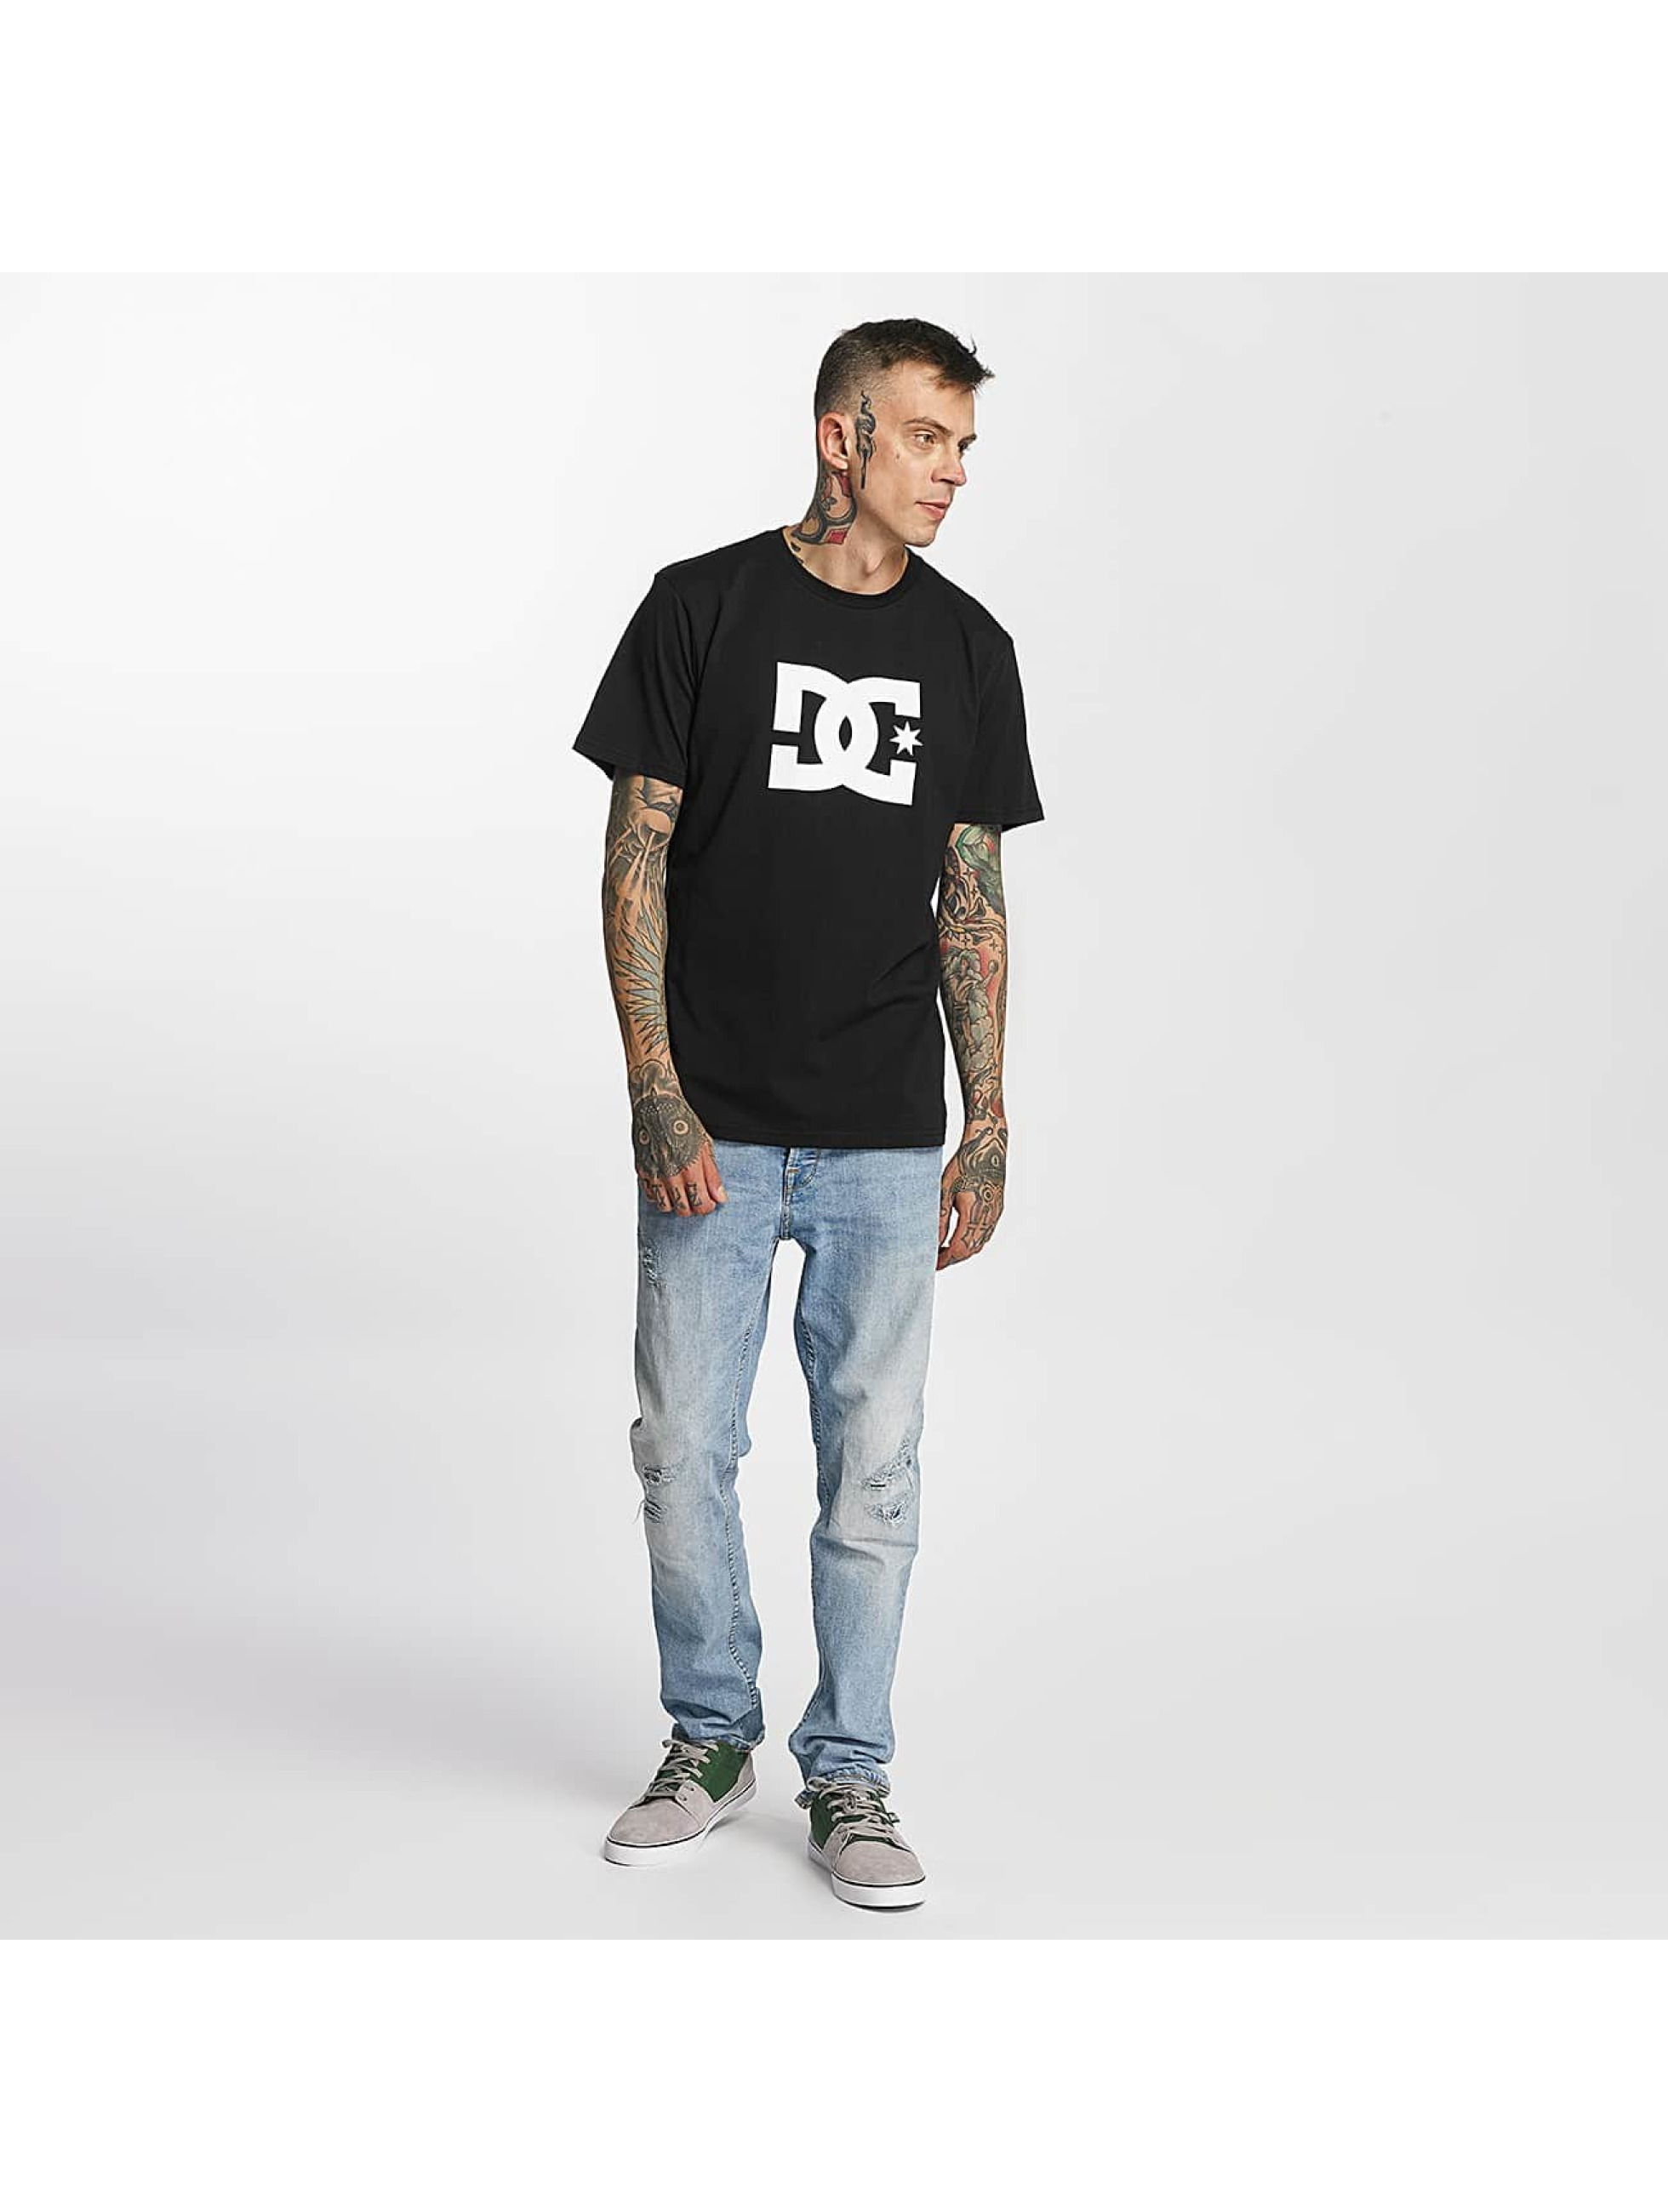 DC-Uomini-Maglieria-T-shirt-Star-SS